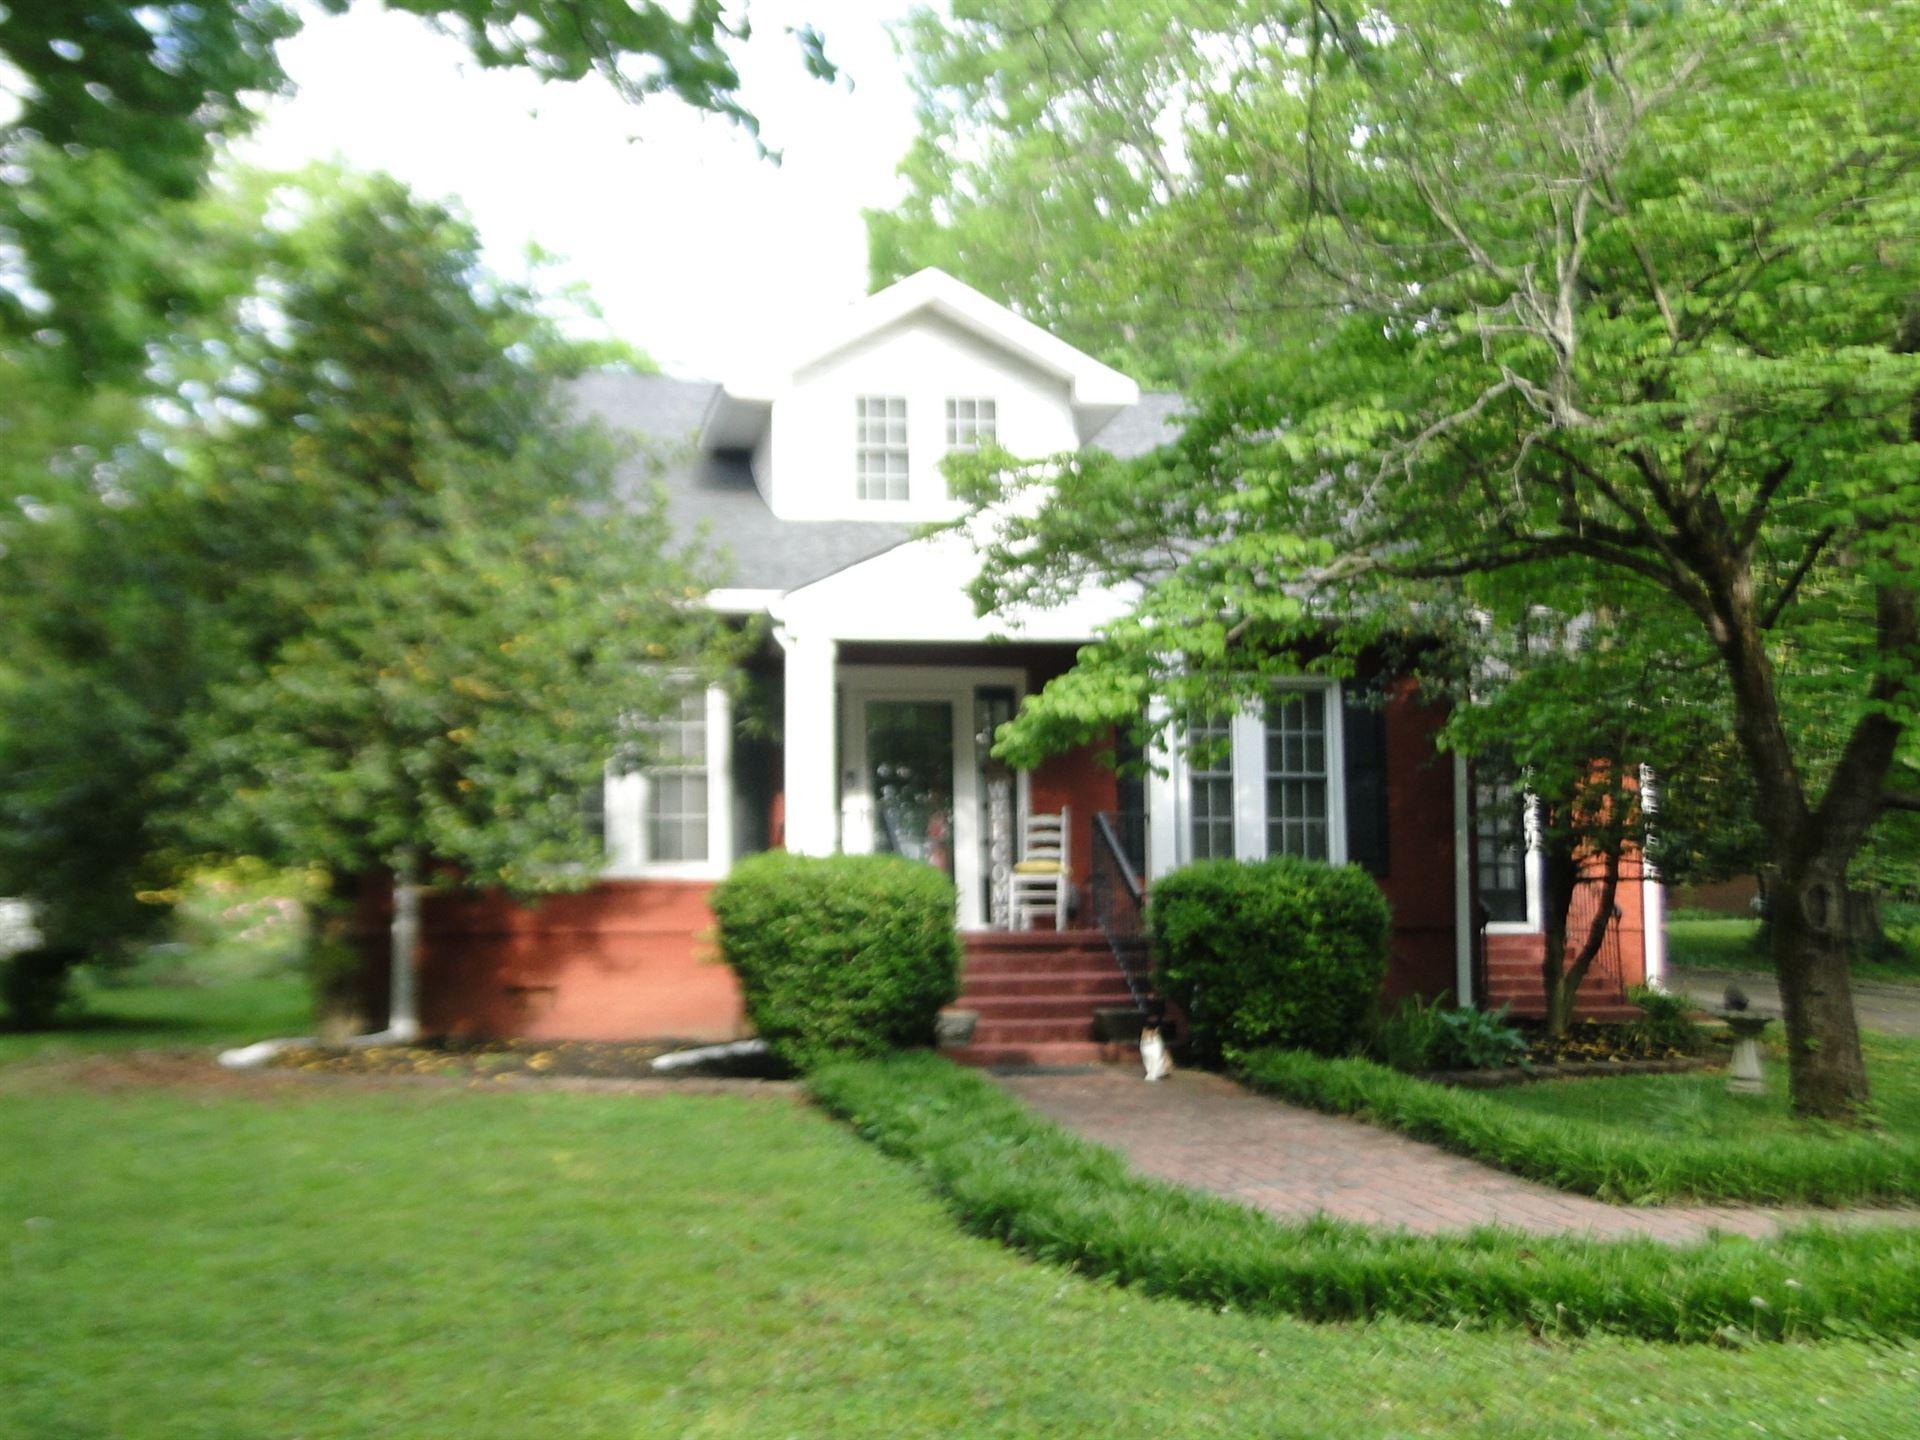 508 Bryant St, Shelbyville, TN 37160 - MLS#: 2250700